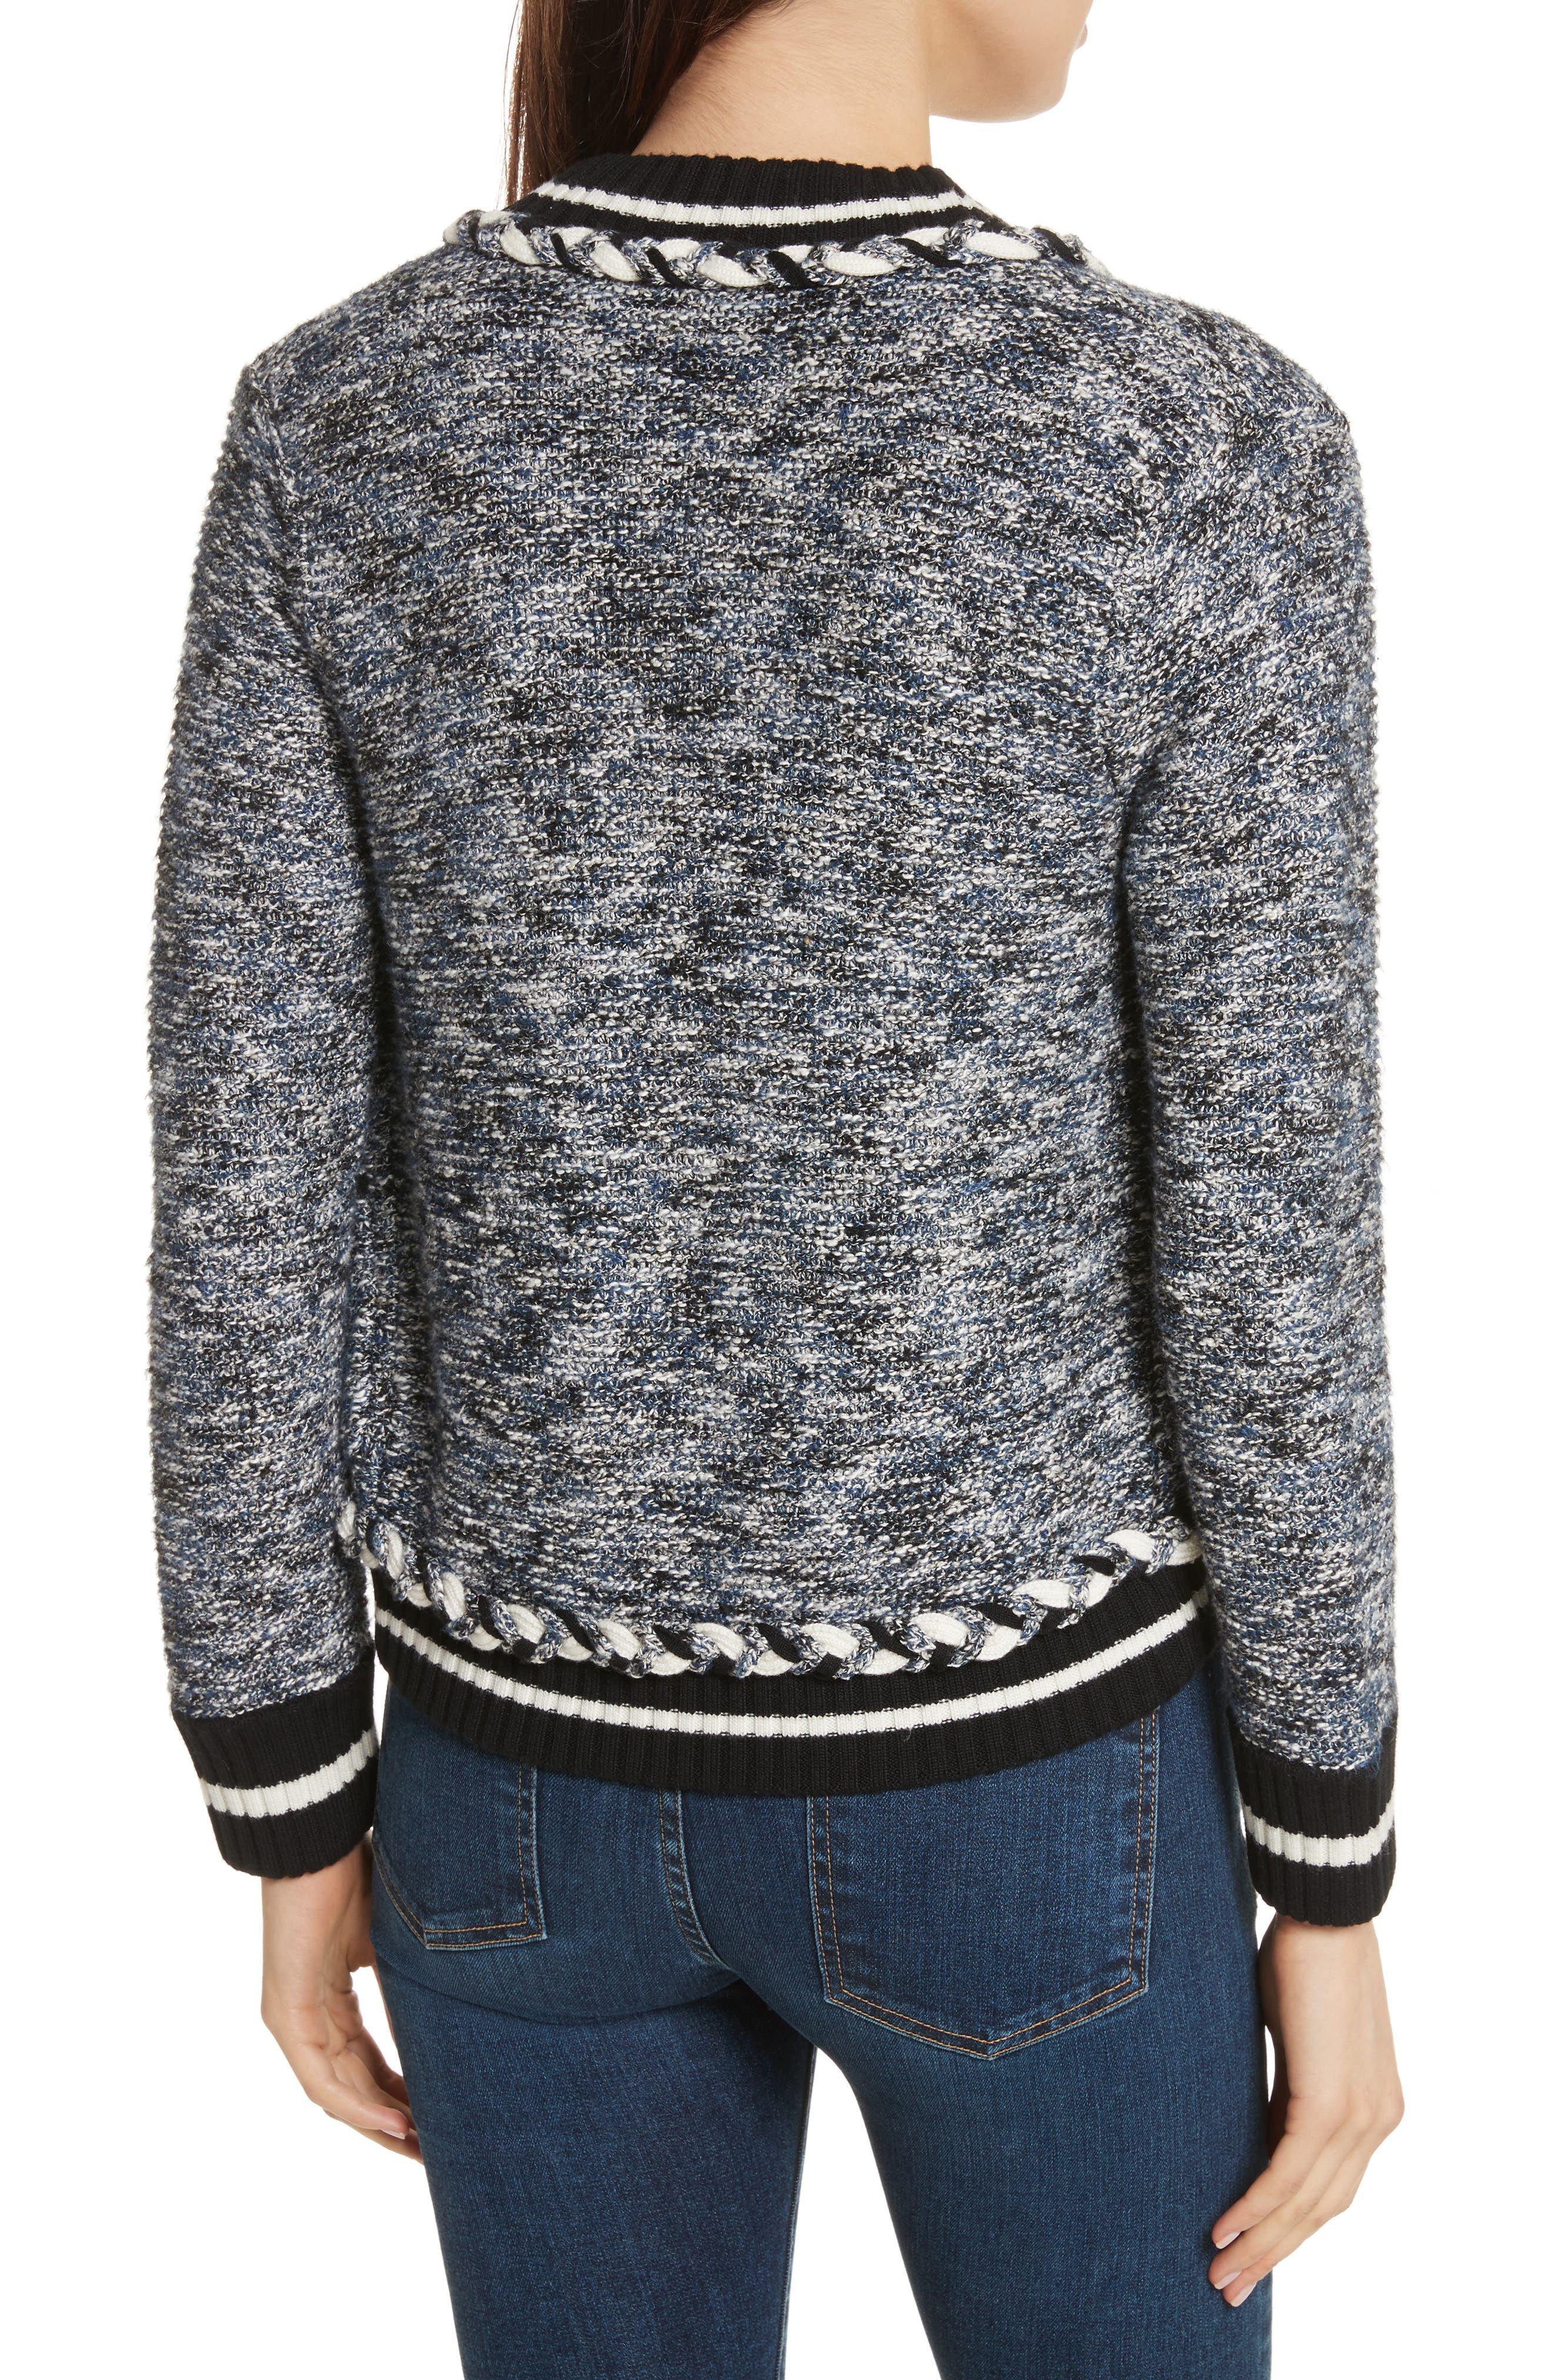 Davis Tweed Sweater Jacket,                             Alternate thumbnail 2, color,                             Navy